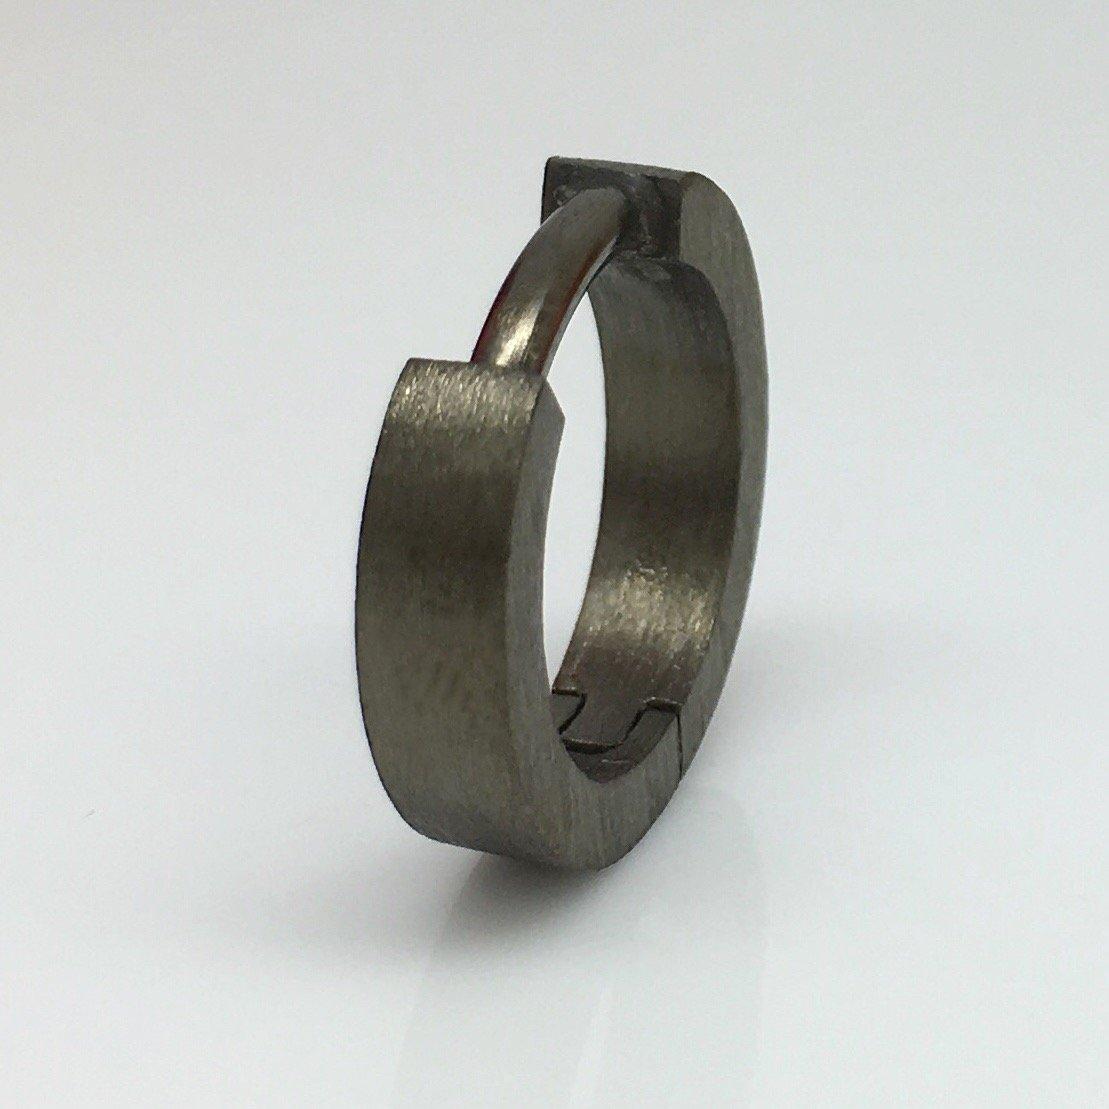 eb87406d7 14 Gauge hoop earring for men